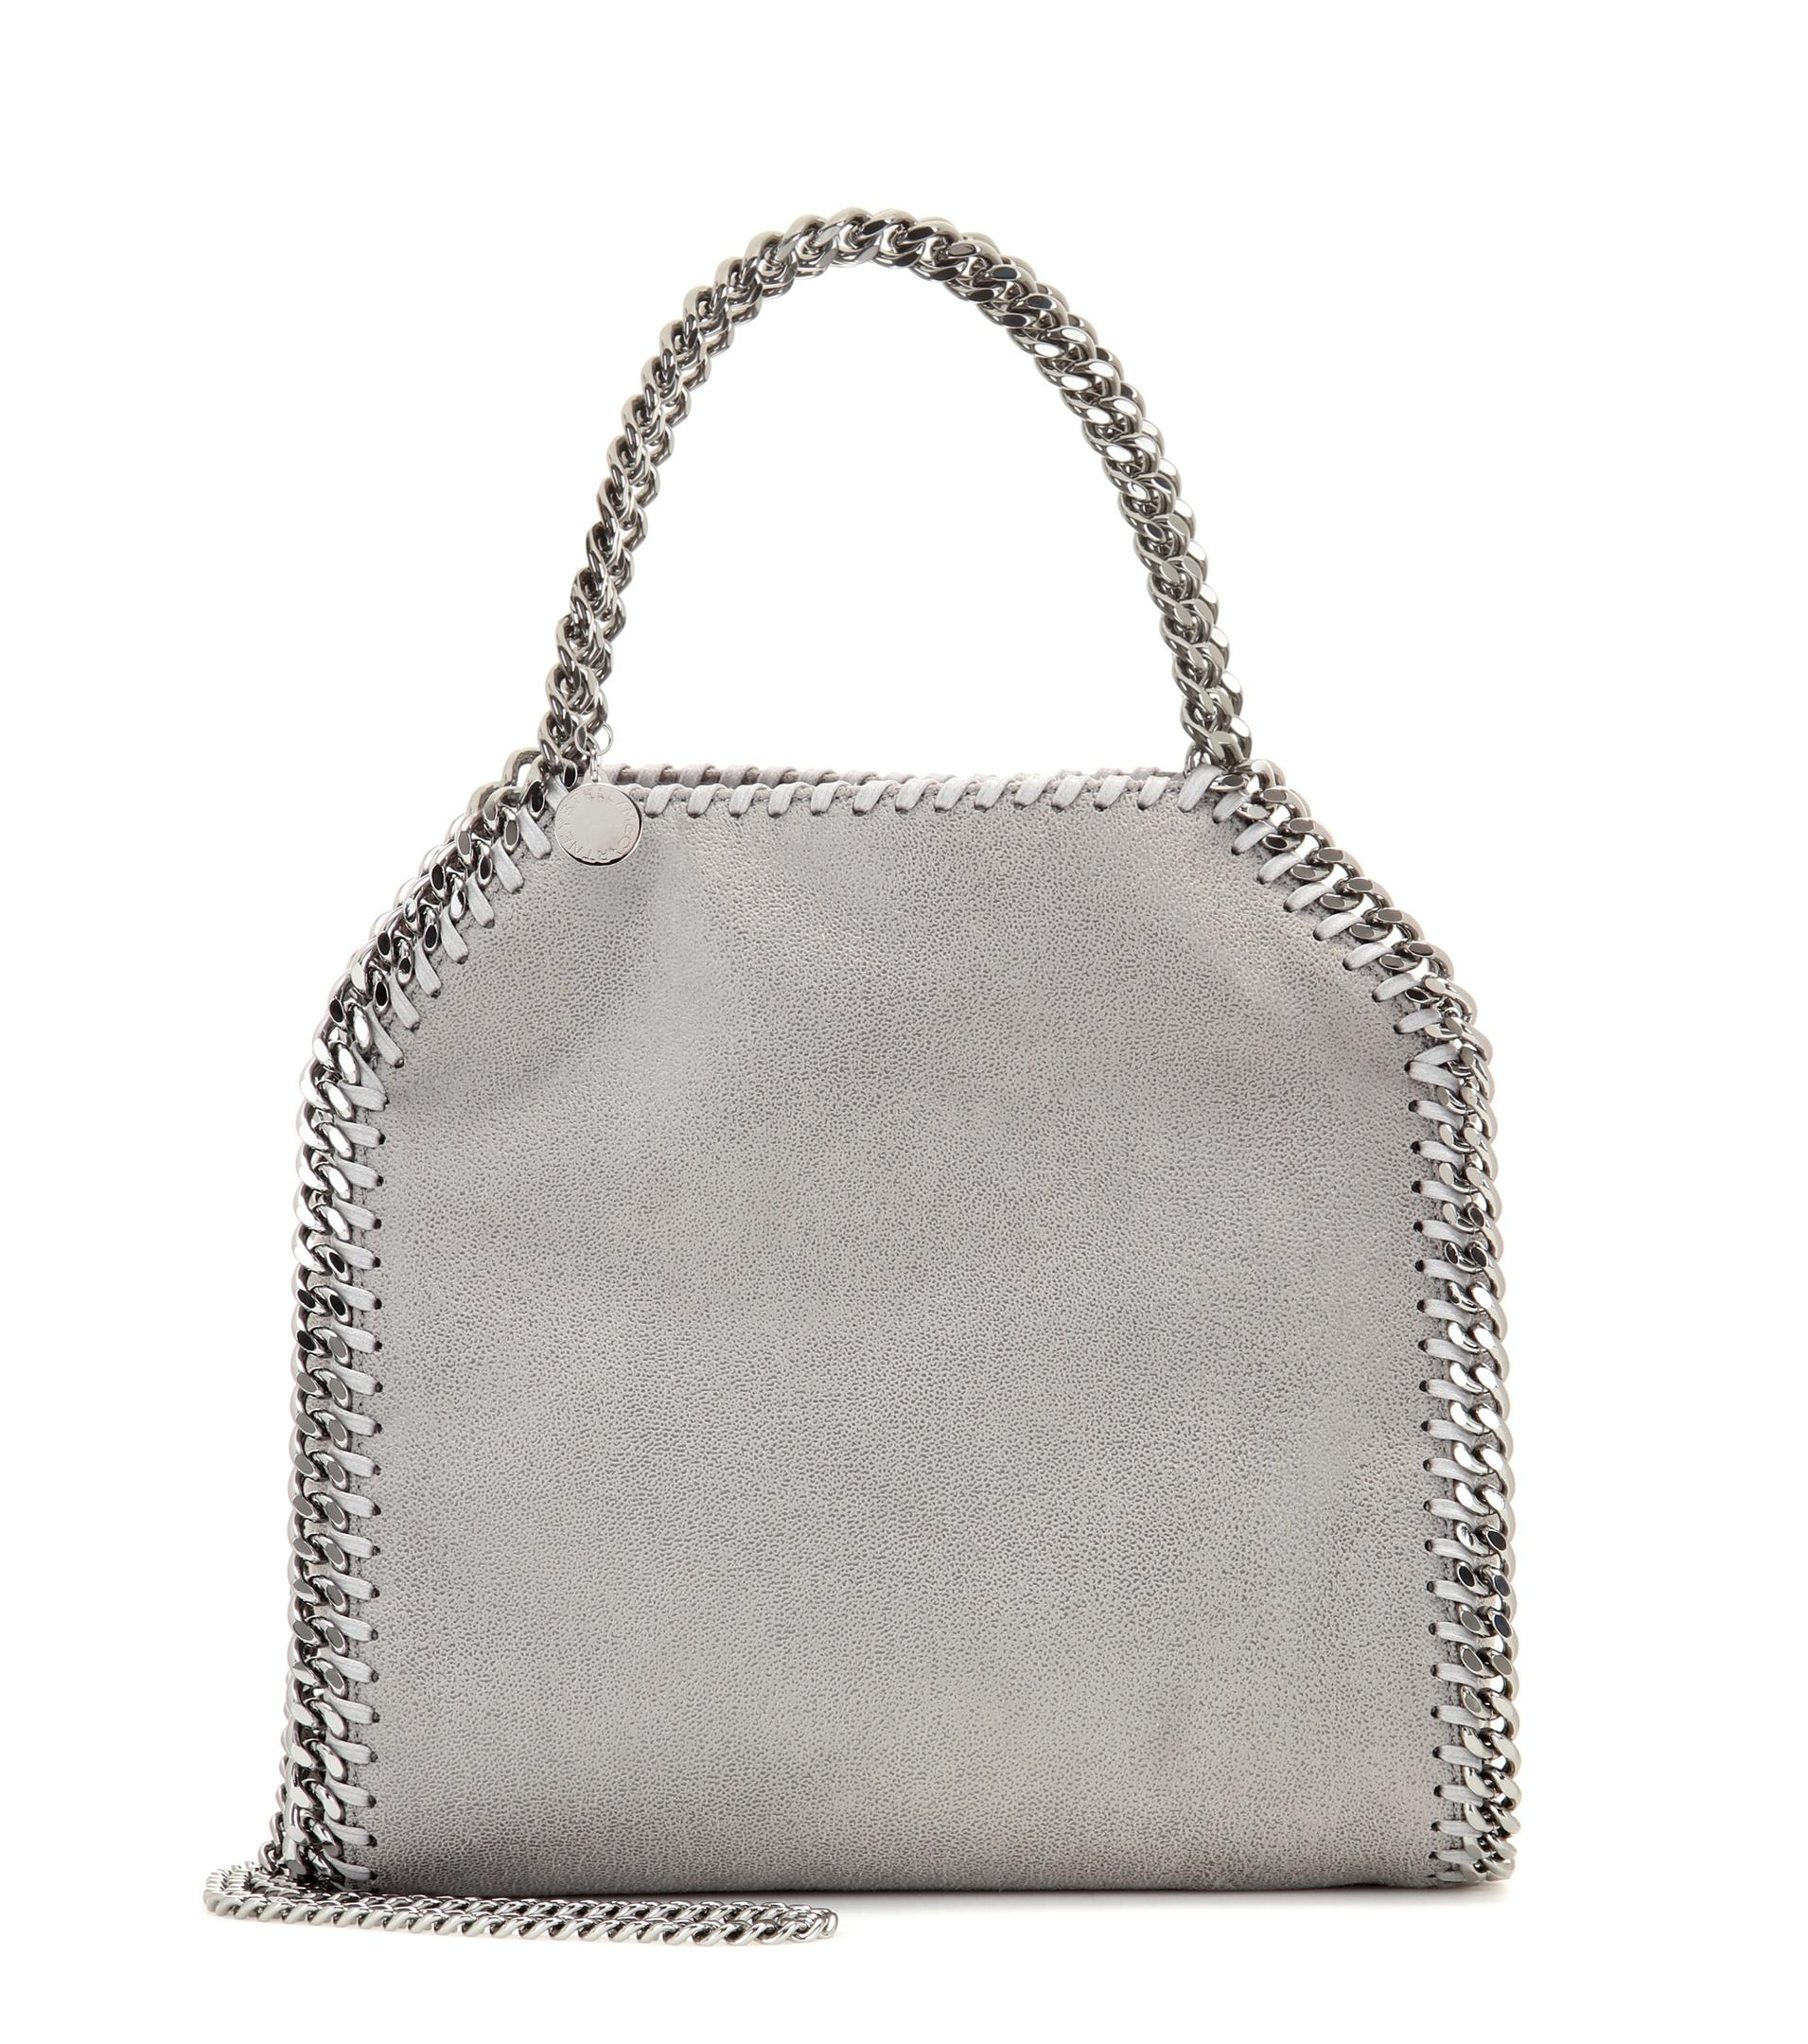 lyst stella mccartney falabella small shoulder bag in gray. Black Bedroom Furniture Sets. Home Design Ideas